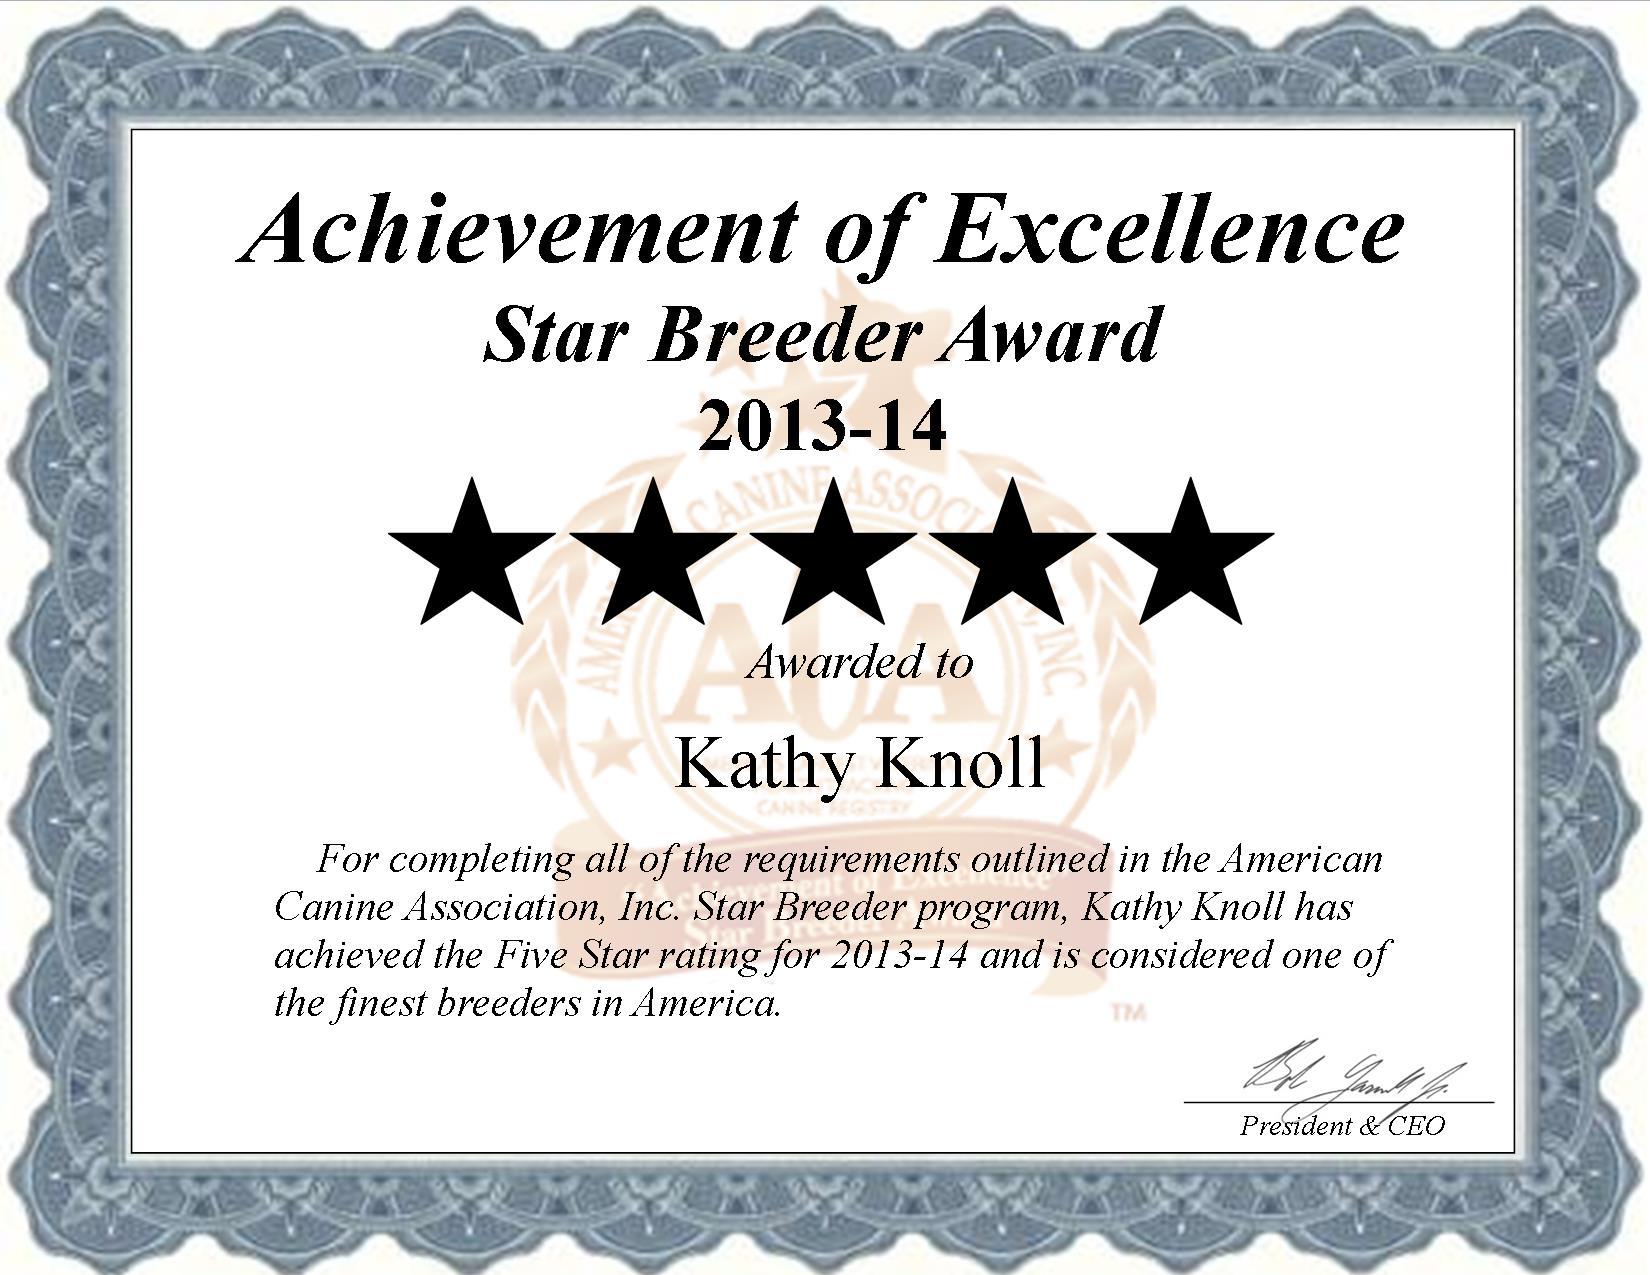 Kathy, Knoll, Kathy Knoll, Knoll Kennel, breeder, star breeder, aca, star breeder, 5 star, Novelty, Missouri, MO, dog, puppy, puppies, dog breeder, dog breeders, missouri breeder, Kathy Knoll dog breeder